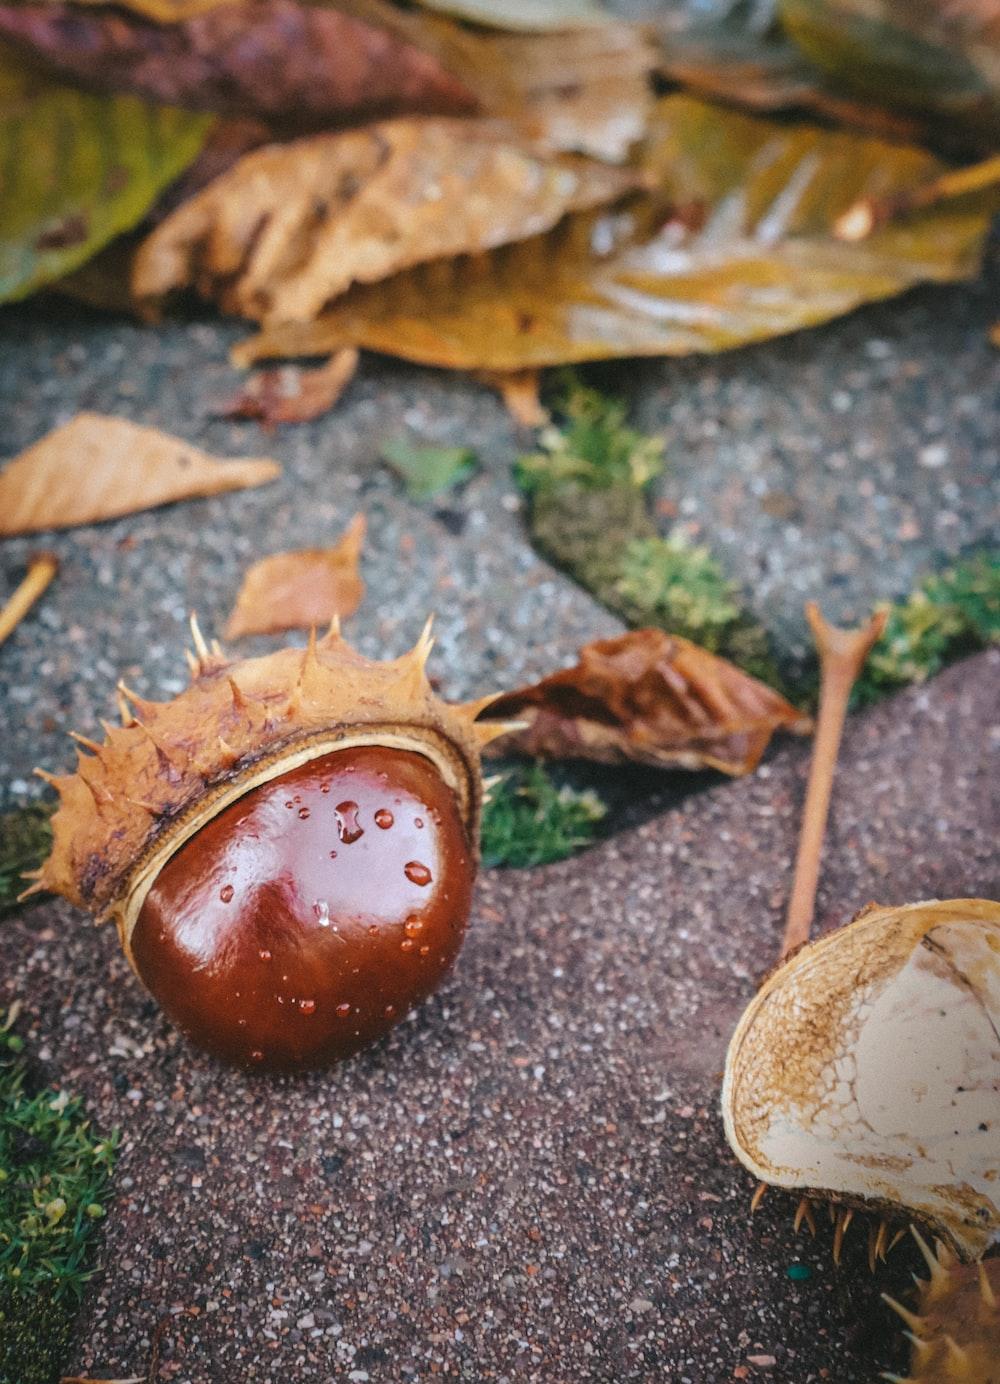 brown fruit on gray concrete floor